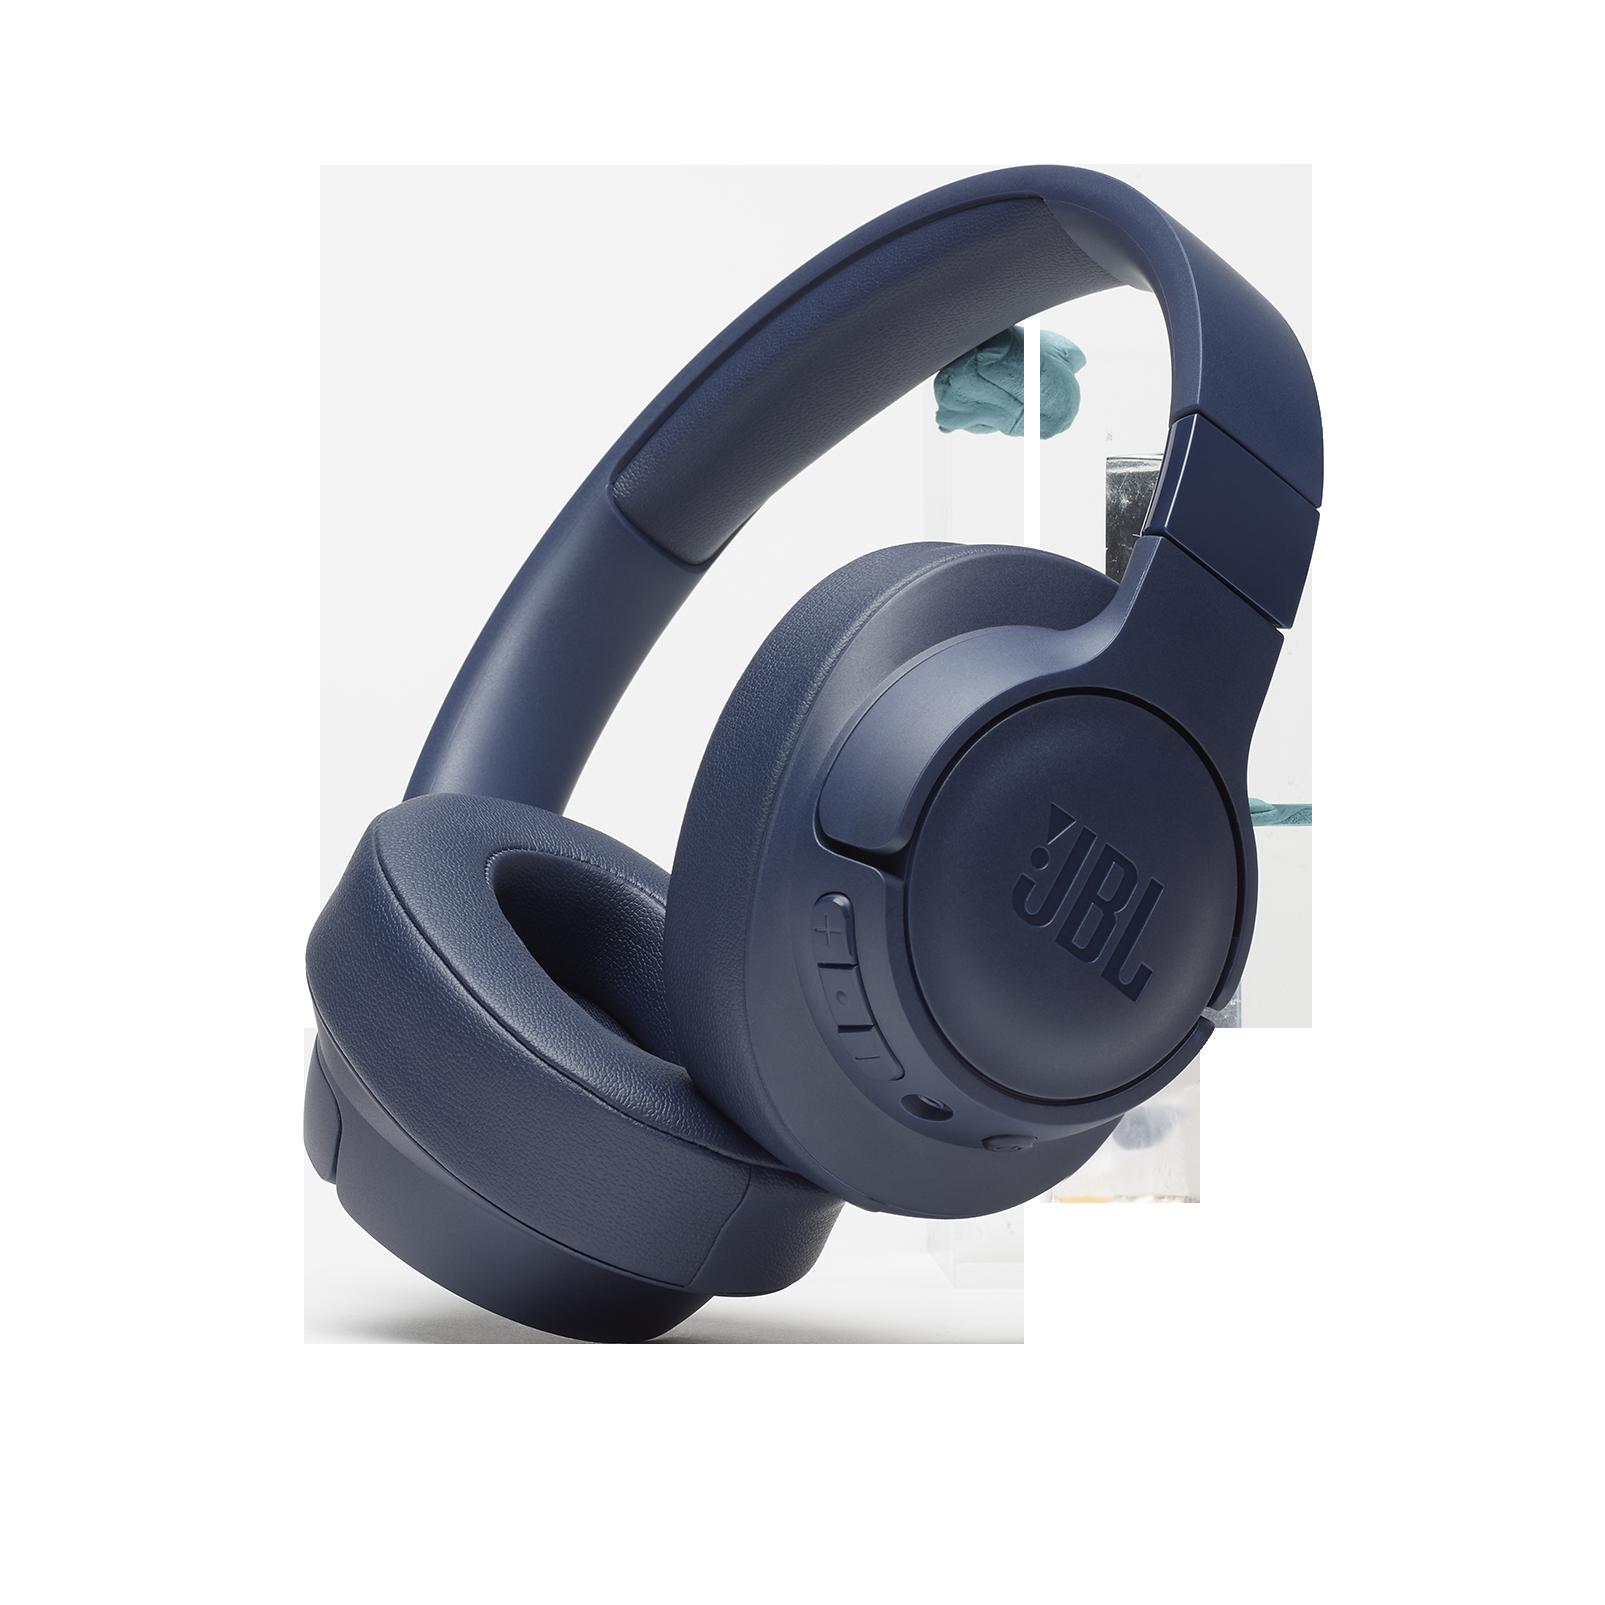 JBL TUNE 700BT - Blue - Wireless Over-Ear Headphones - Hero